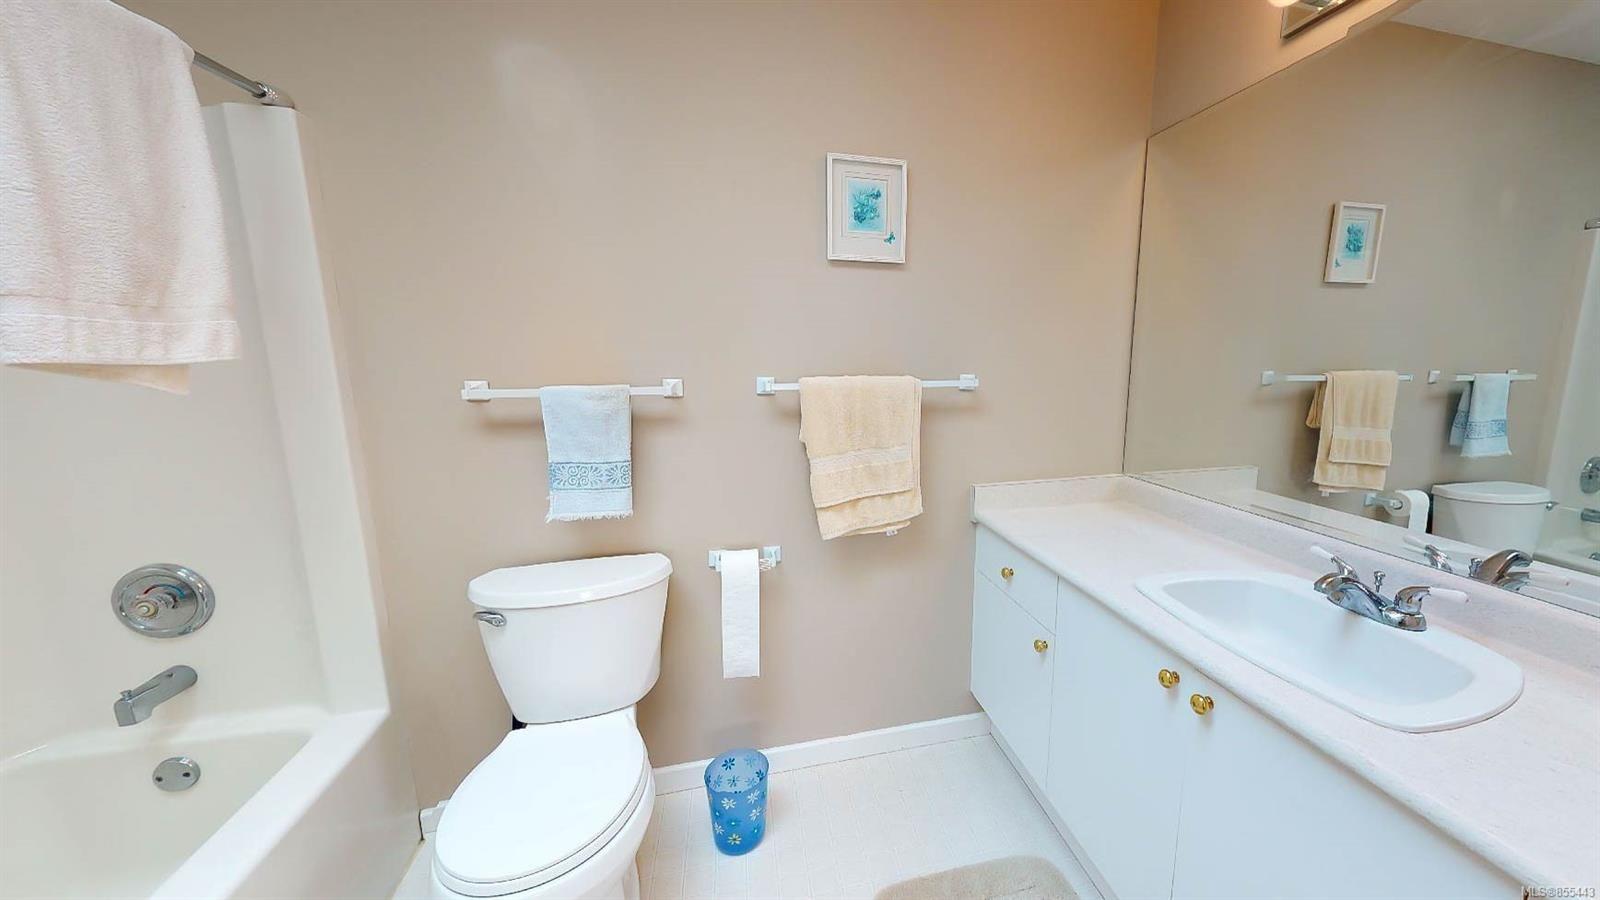 Photo 22: Photos: 1294 Leeward Way in : PQ Qualicum Beach House for sale (Parksville/Qualicum)  : MLS®# 855443